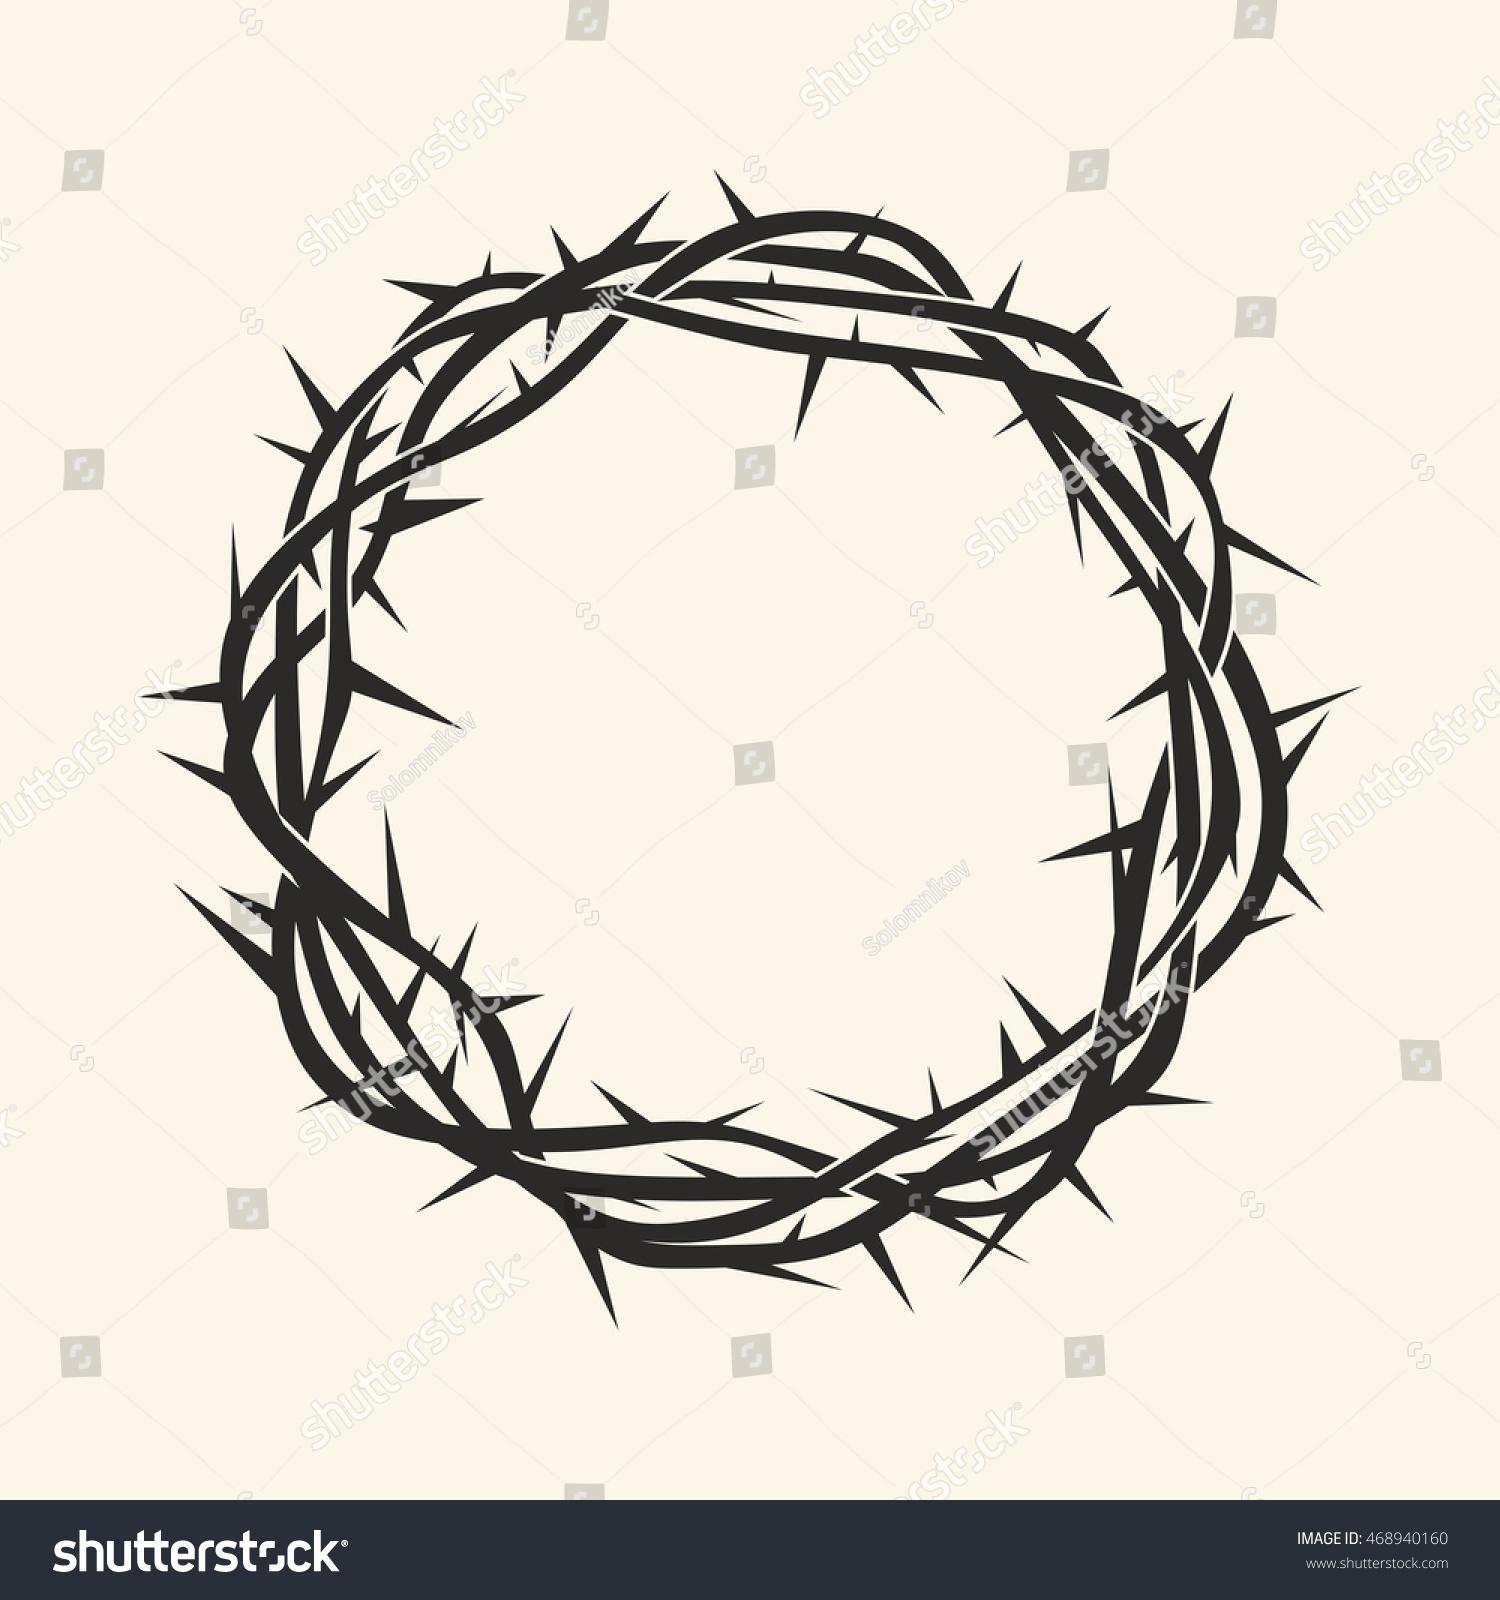 Church Logo Christian Symbols Crown Thorns Stock Photo Photo